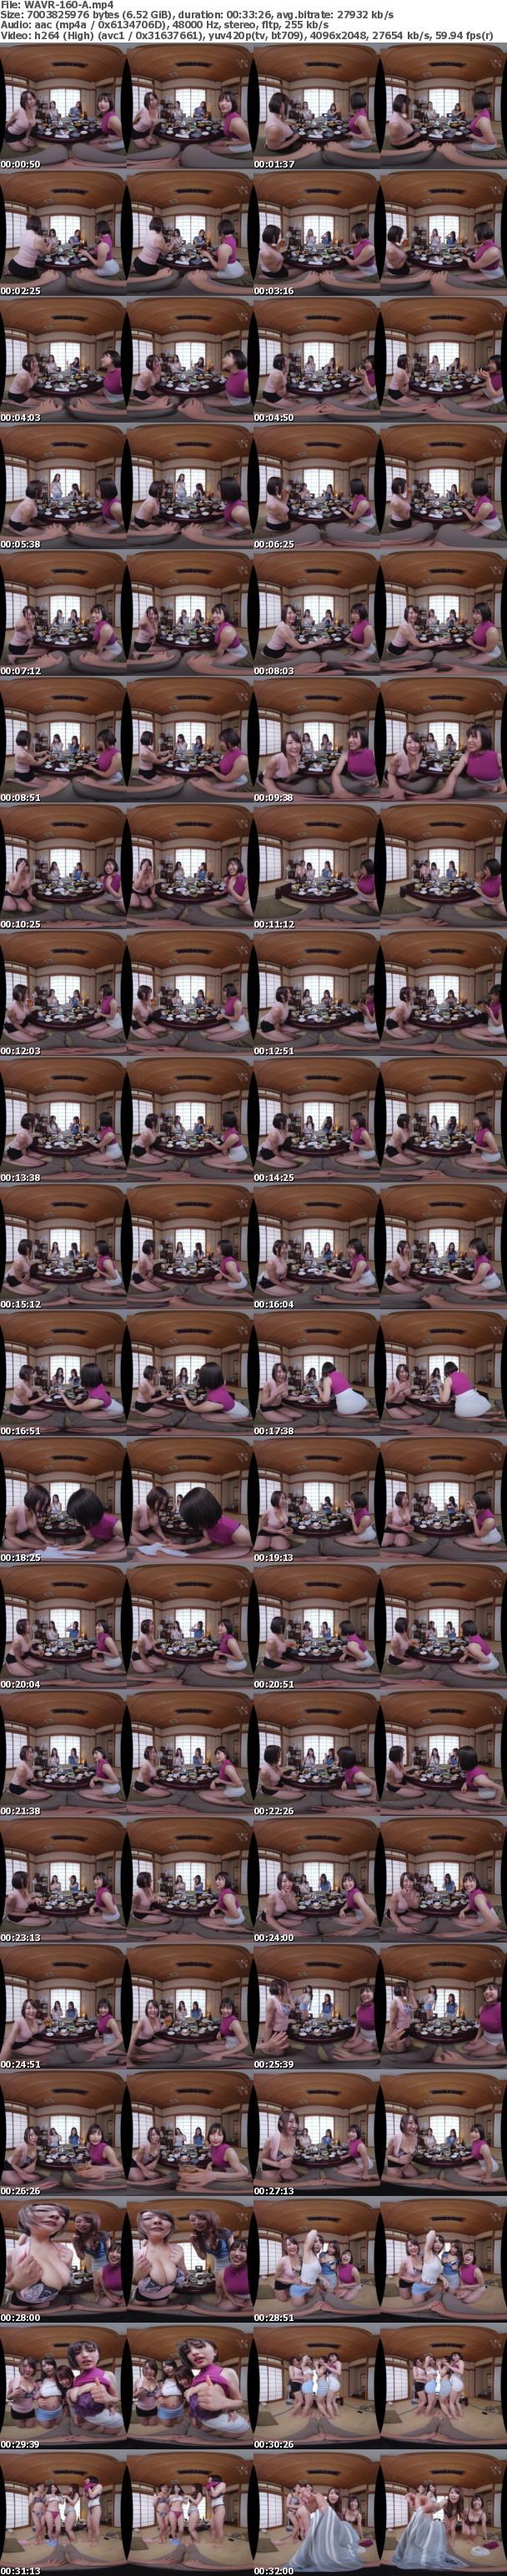 (VR) WAVR-160 酒池肉林!淫乱絶倫!ヤリマンサークルOBが集まる悪ノリ!ゲスノリ!ドスケベ同窓会 なぜか母ちゃんの代わりに同窓会に行くことになったんだが…助けてくれッ!